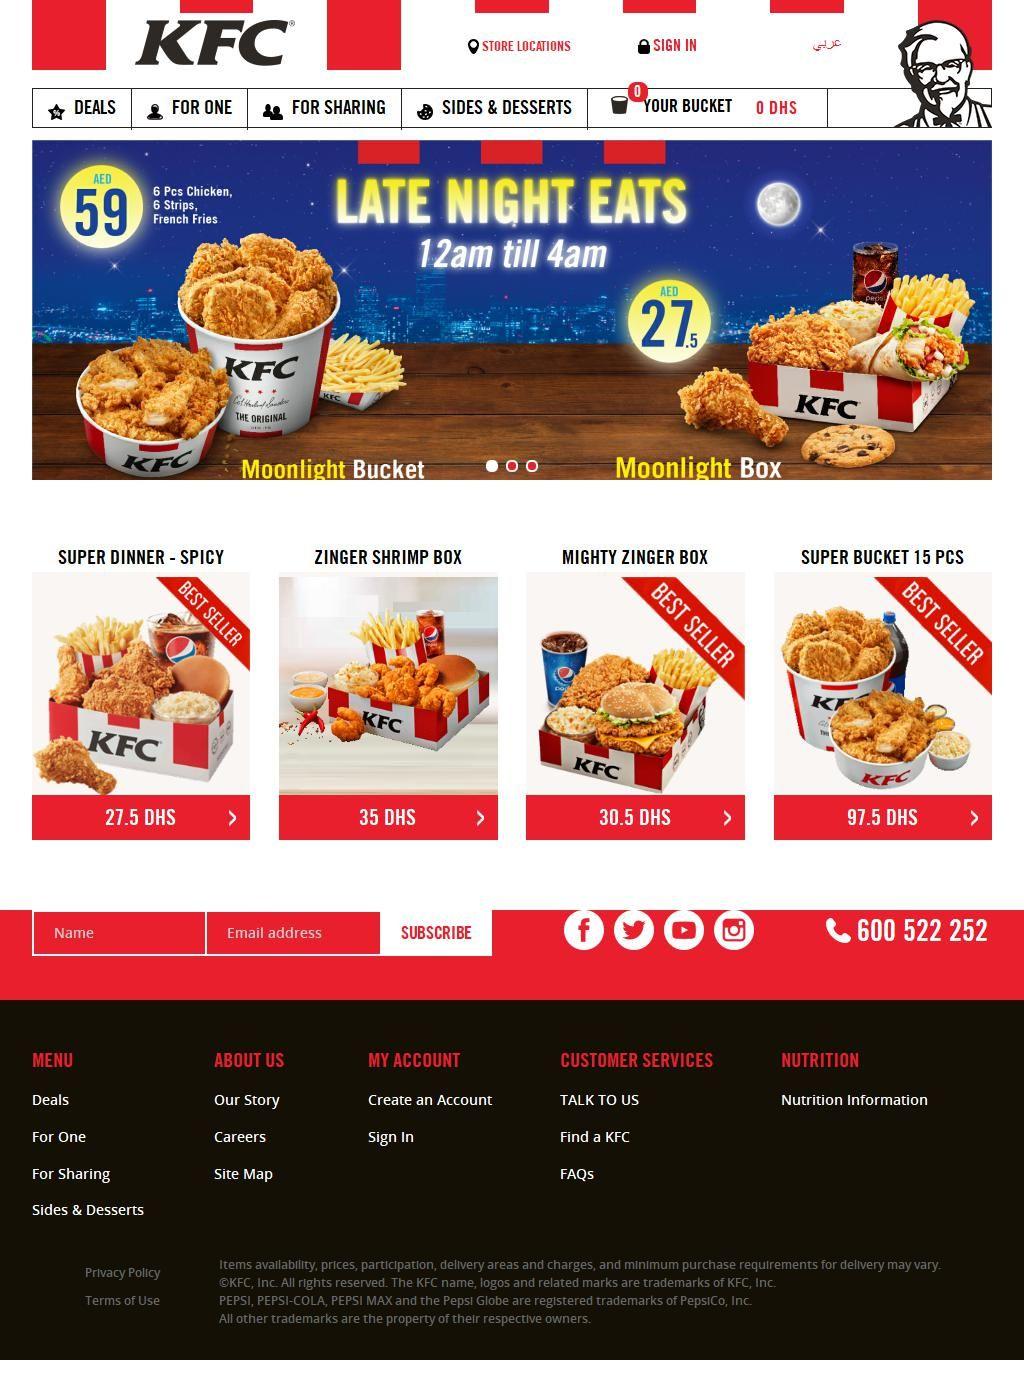 Kfc Fast Food Restaurant Ibn Battuta Mall 1 Garden Cross Road G